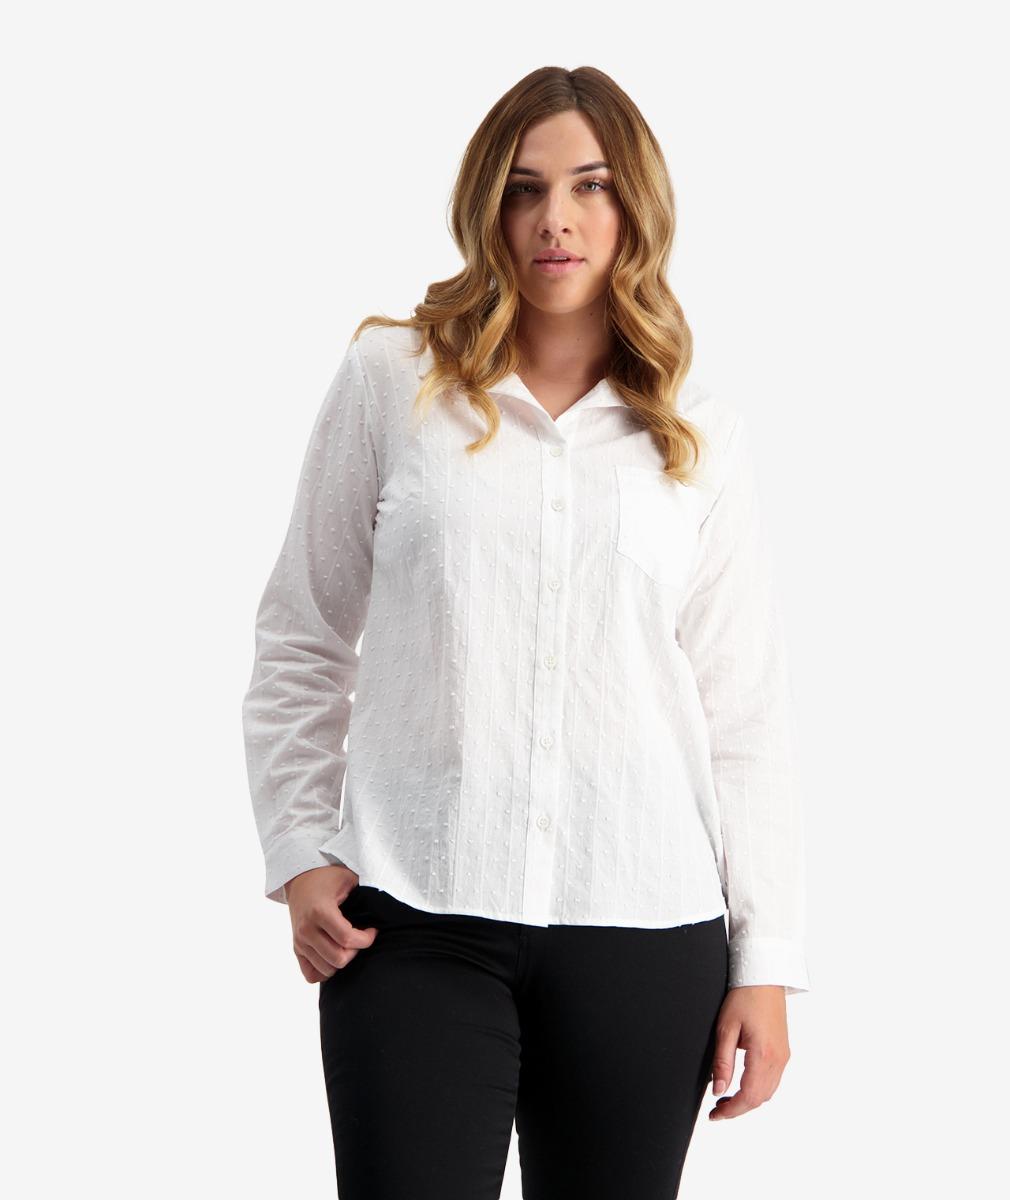 Swanndri Women's Battersea Cotton Textured Shirt